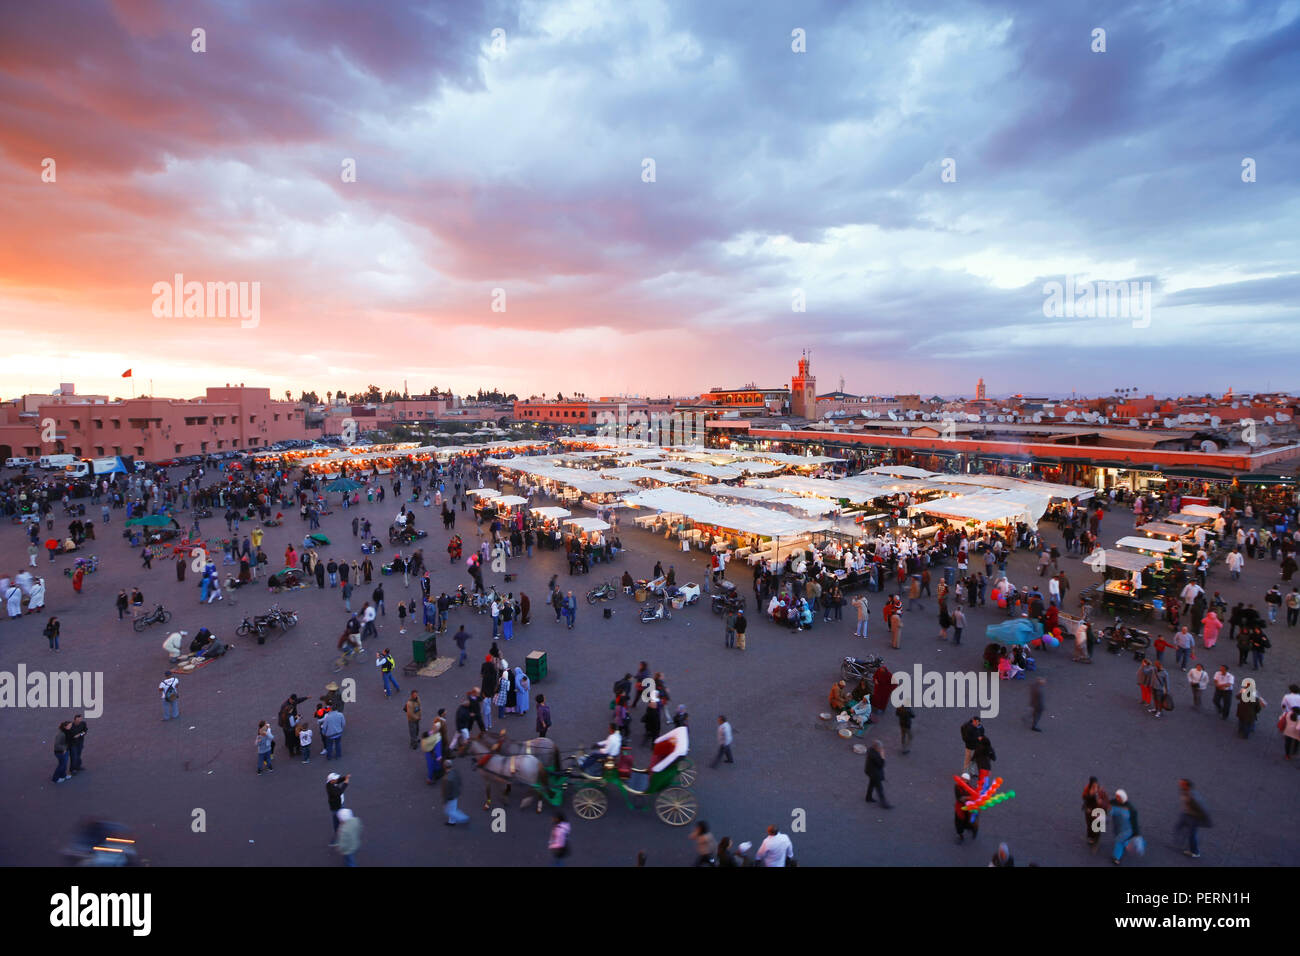 Erhöhten Blick auf die Djemaa el-Fna, Afrika, Nordafrika, Marokko, Marrakesch (Marrakech) Stockbild